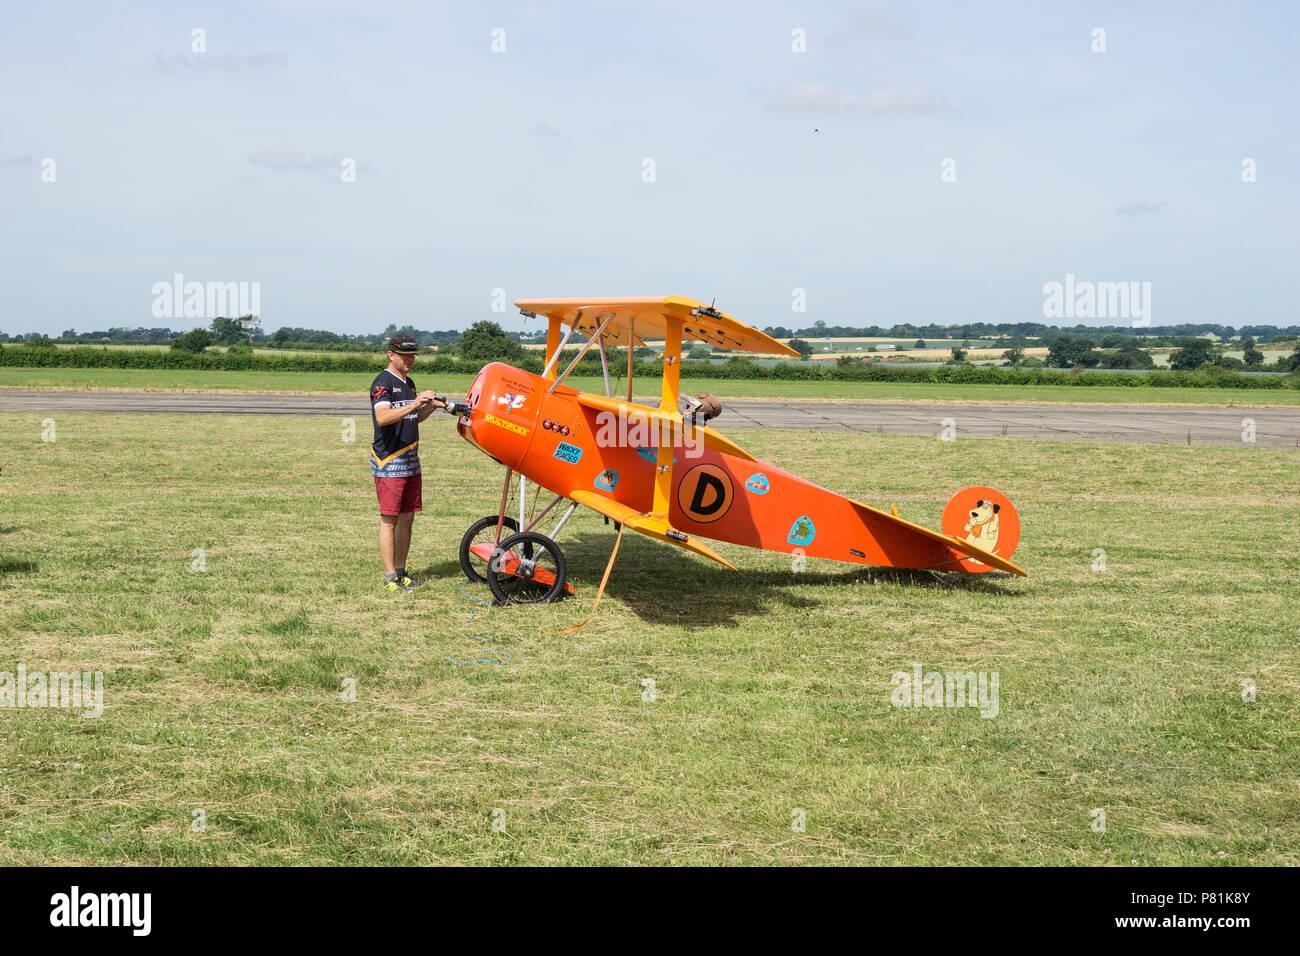 large-model-of-fokker-dri-triplane-with-builder-at-wings-and-wheels-P81K8Y.jpg